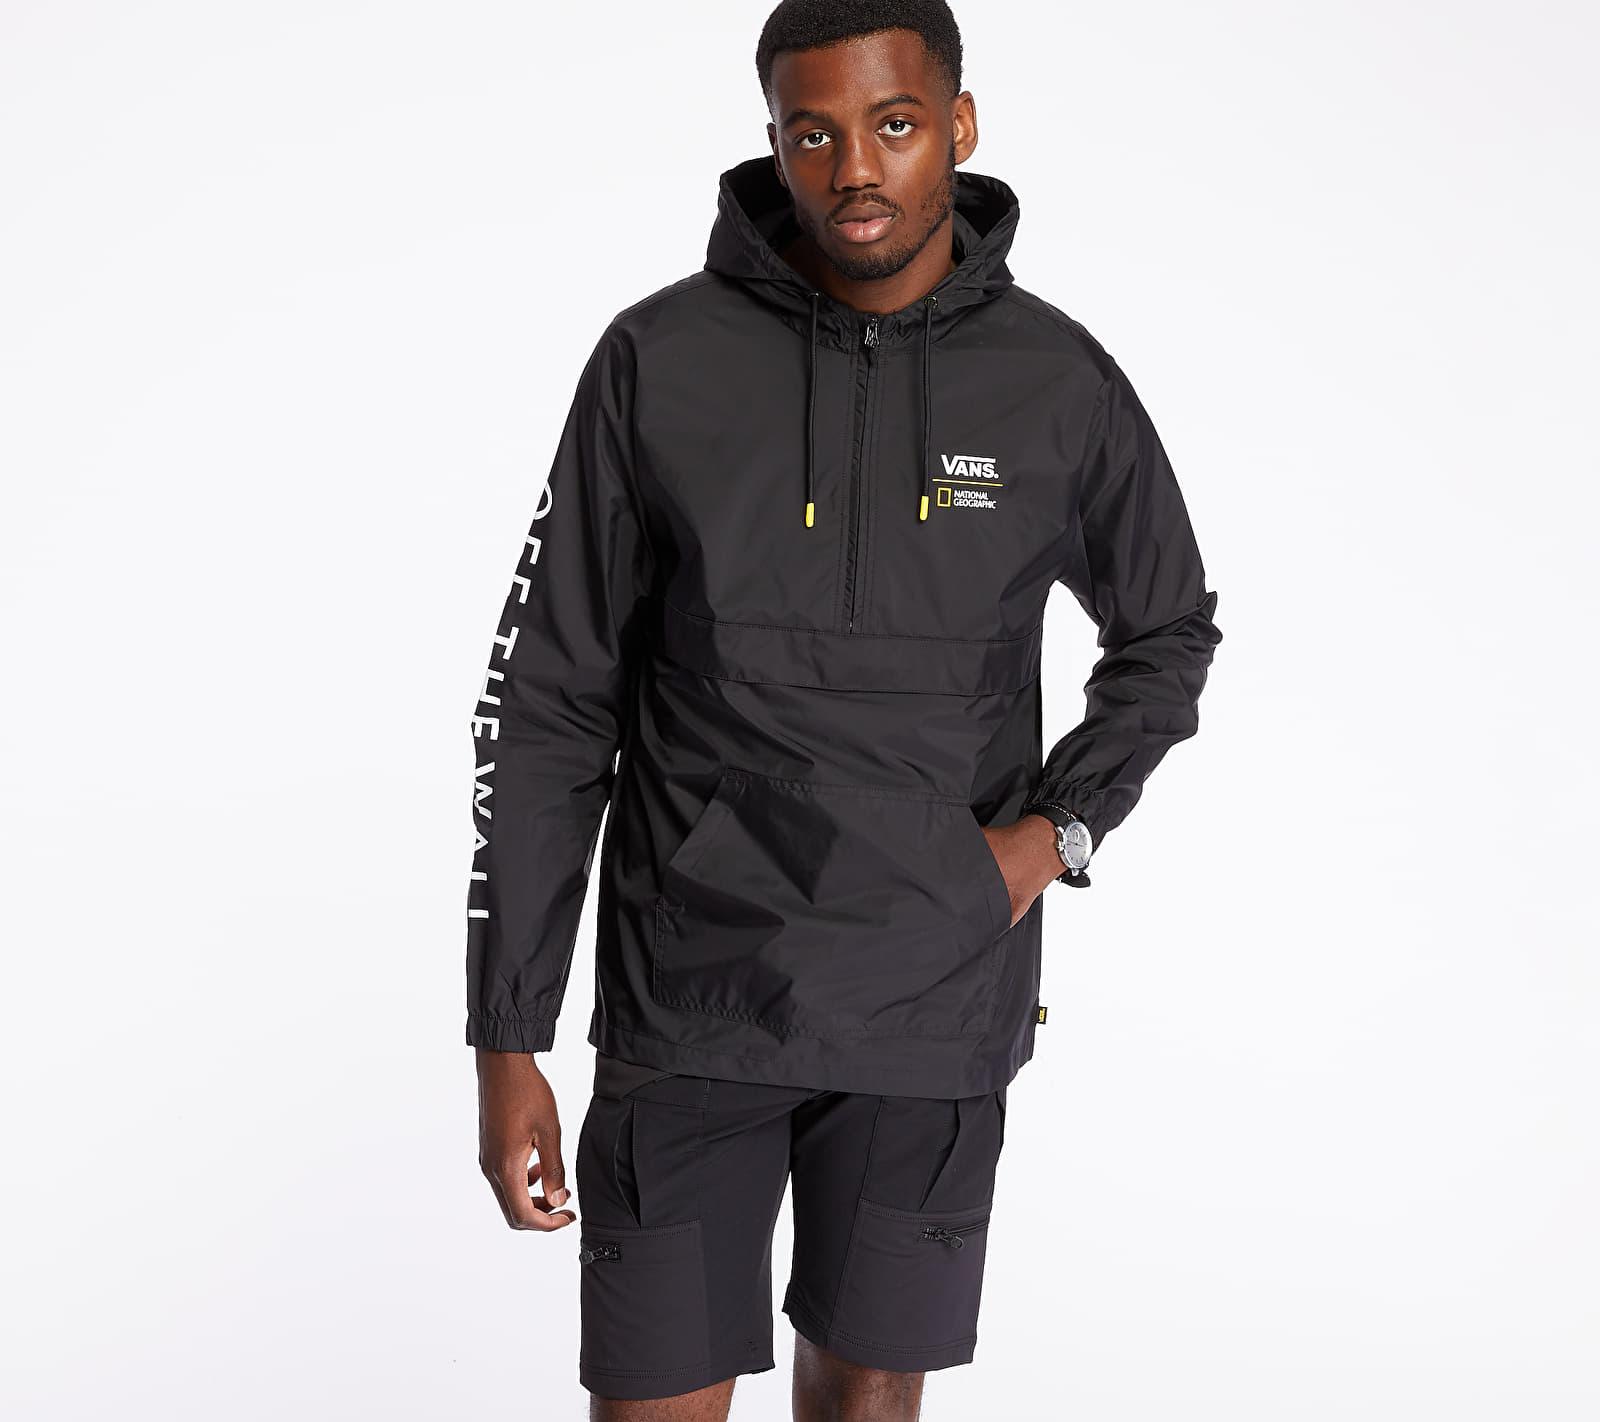 Vans x National Geographic Anorak Jacket Black